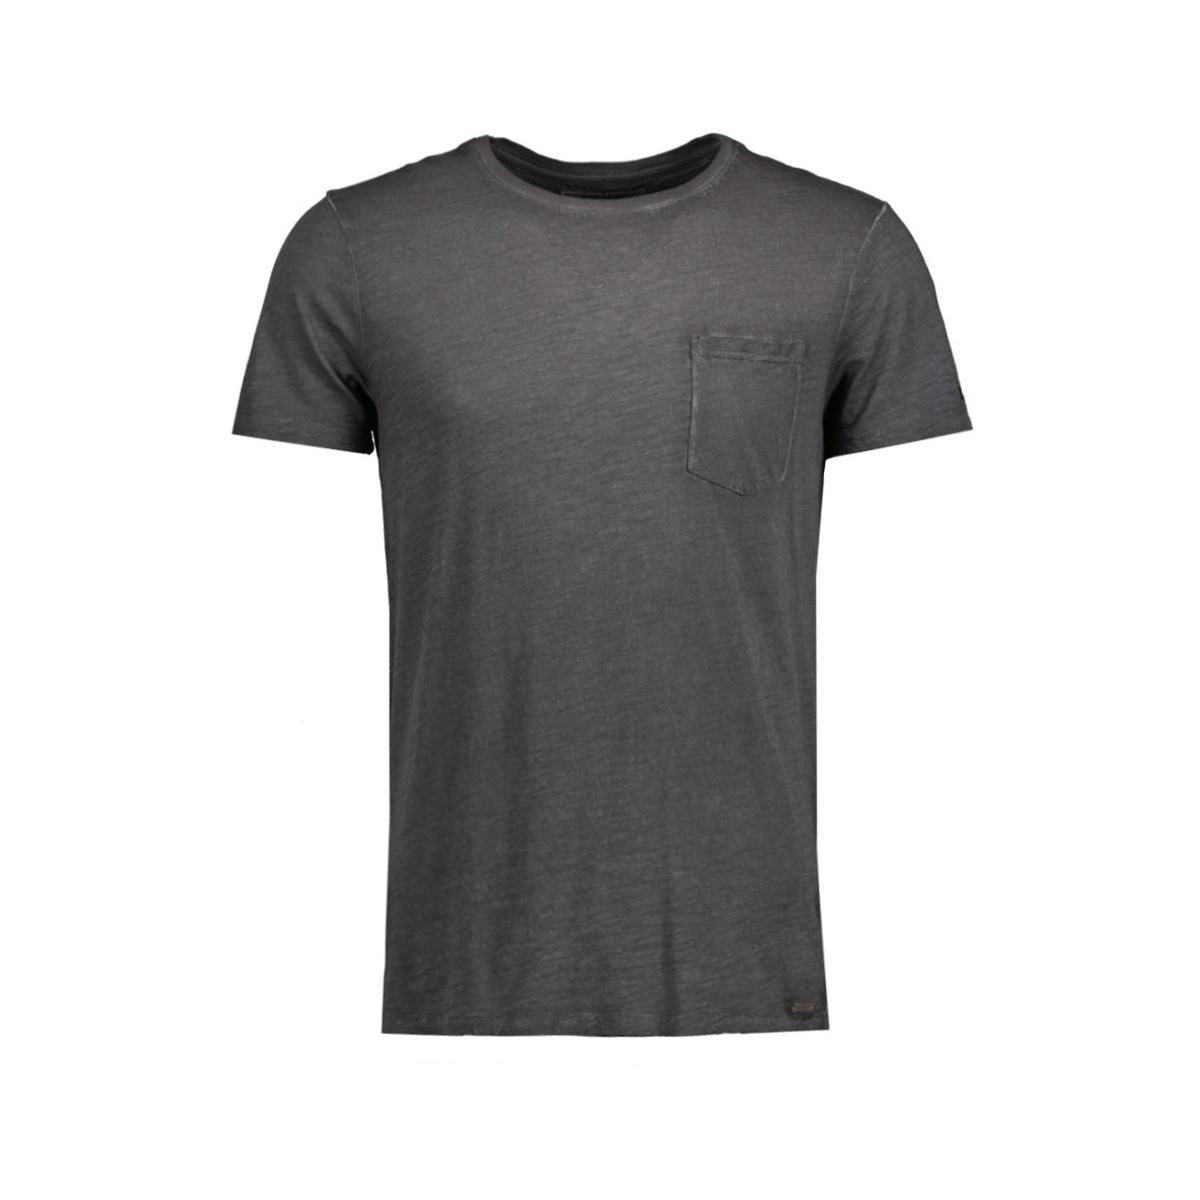 z1063 garcia t-shirt 60 black